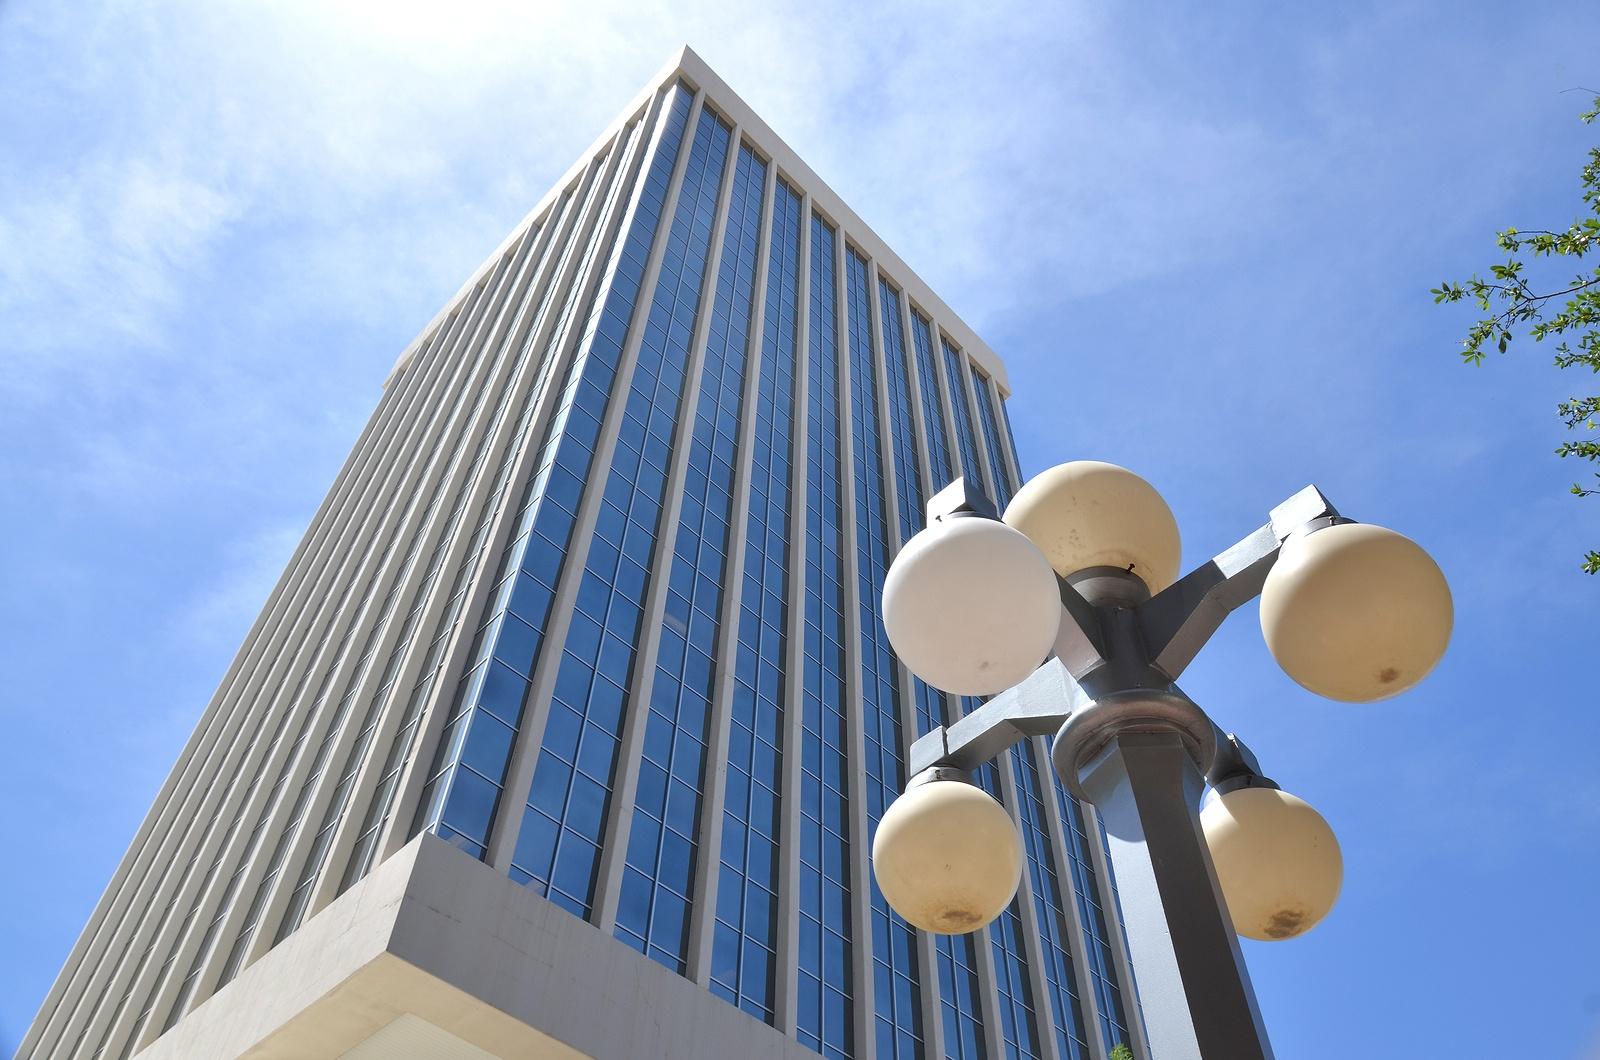 bigstock-Building-inTucson-65794756-1